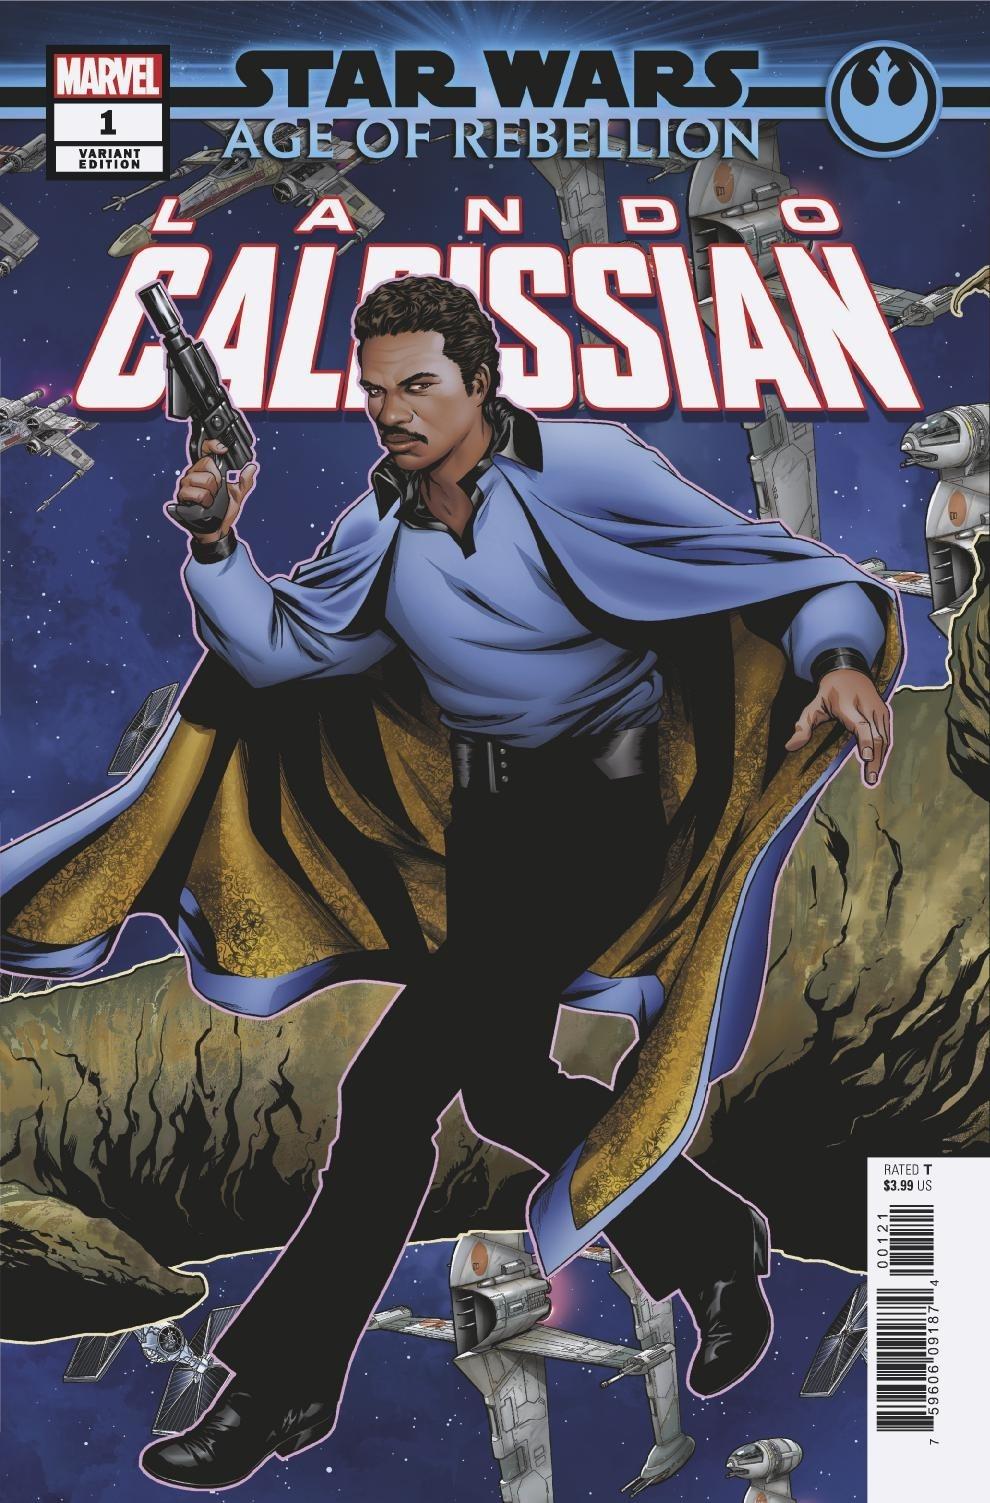 Age of Rebellion: Lando Calrissian #1 (Mike McKone Puzzle Piece Variant Cover 15 of 27) (15.05.2019)